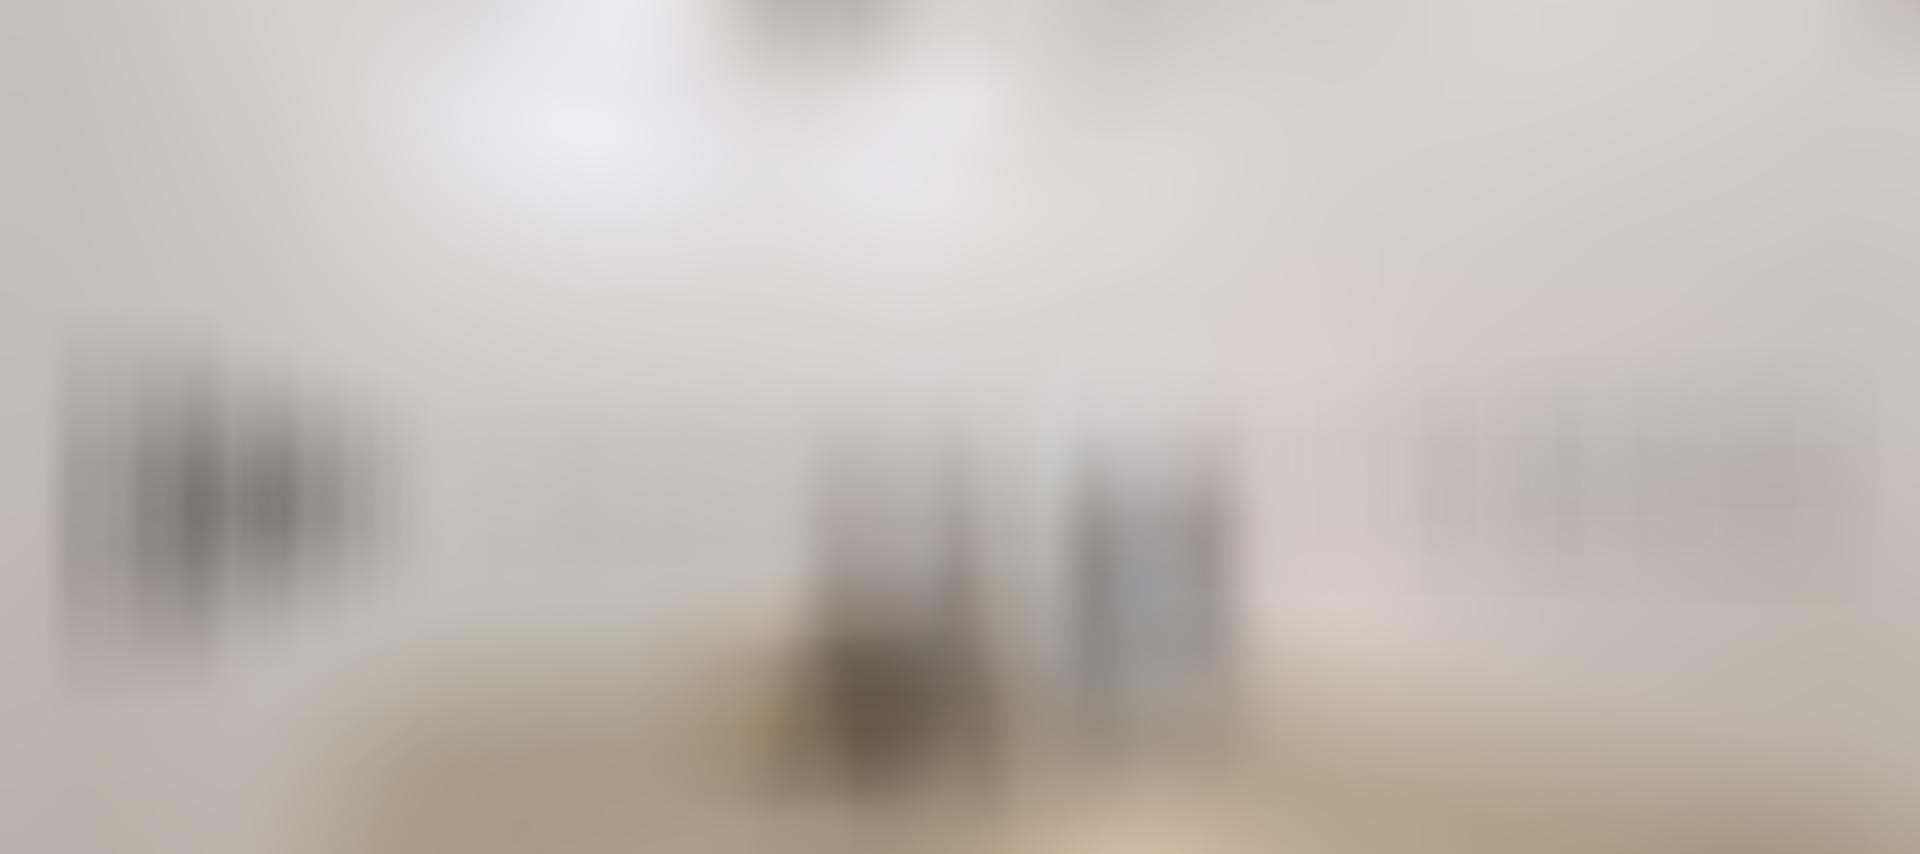 Patti Smith: BALTIC Installation shot by Colin Davison